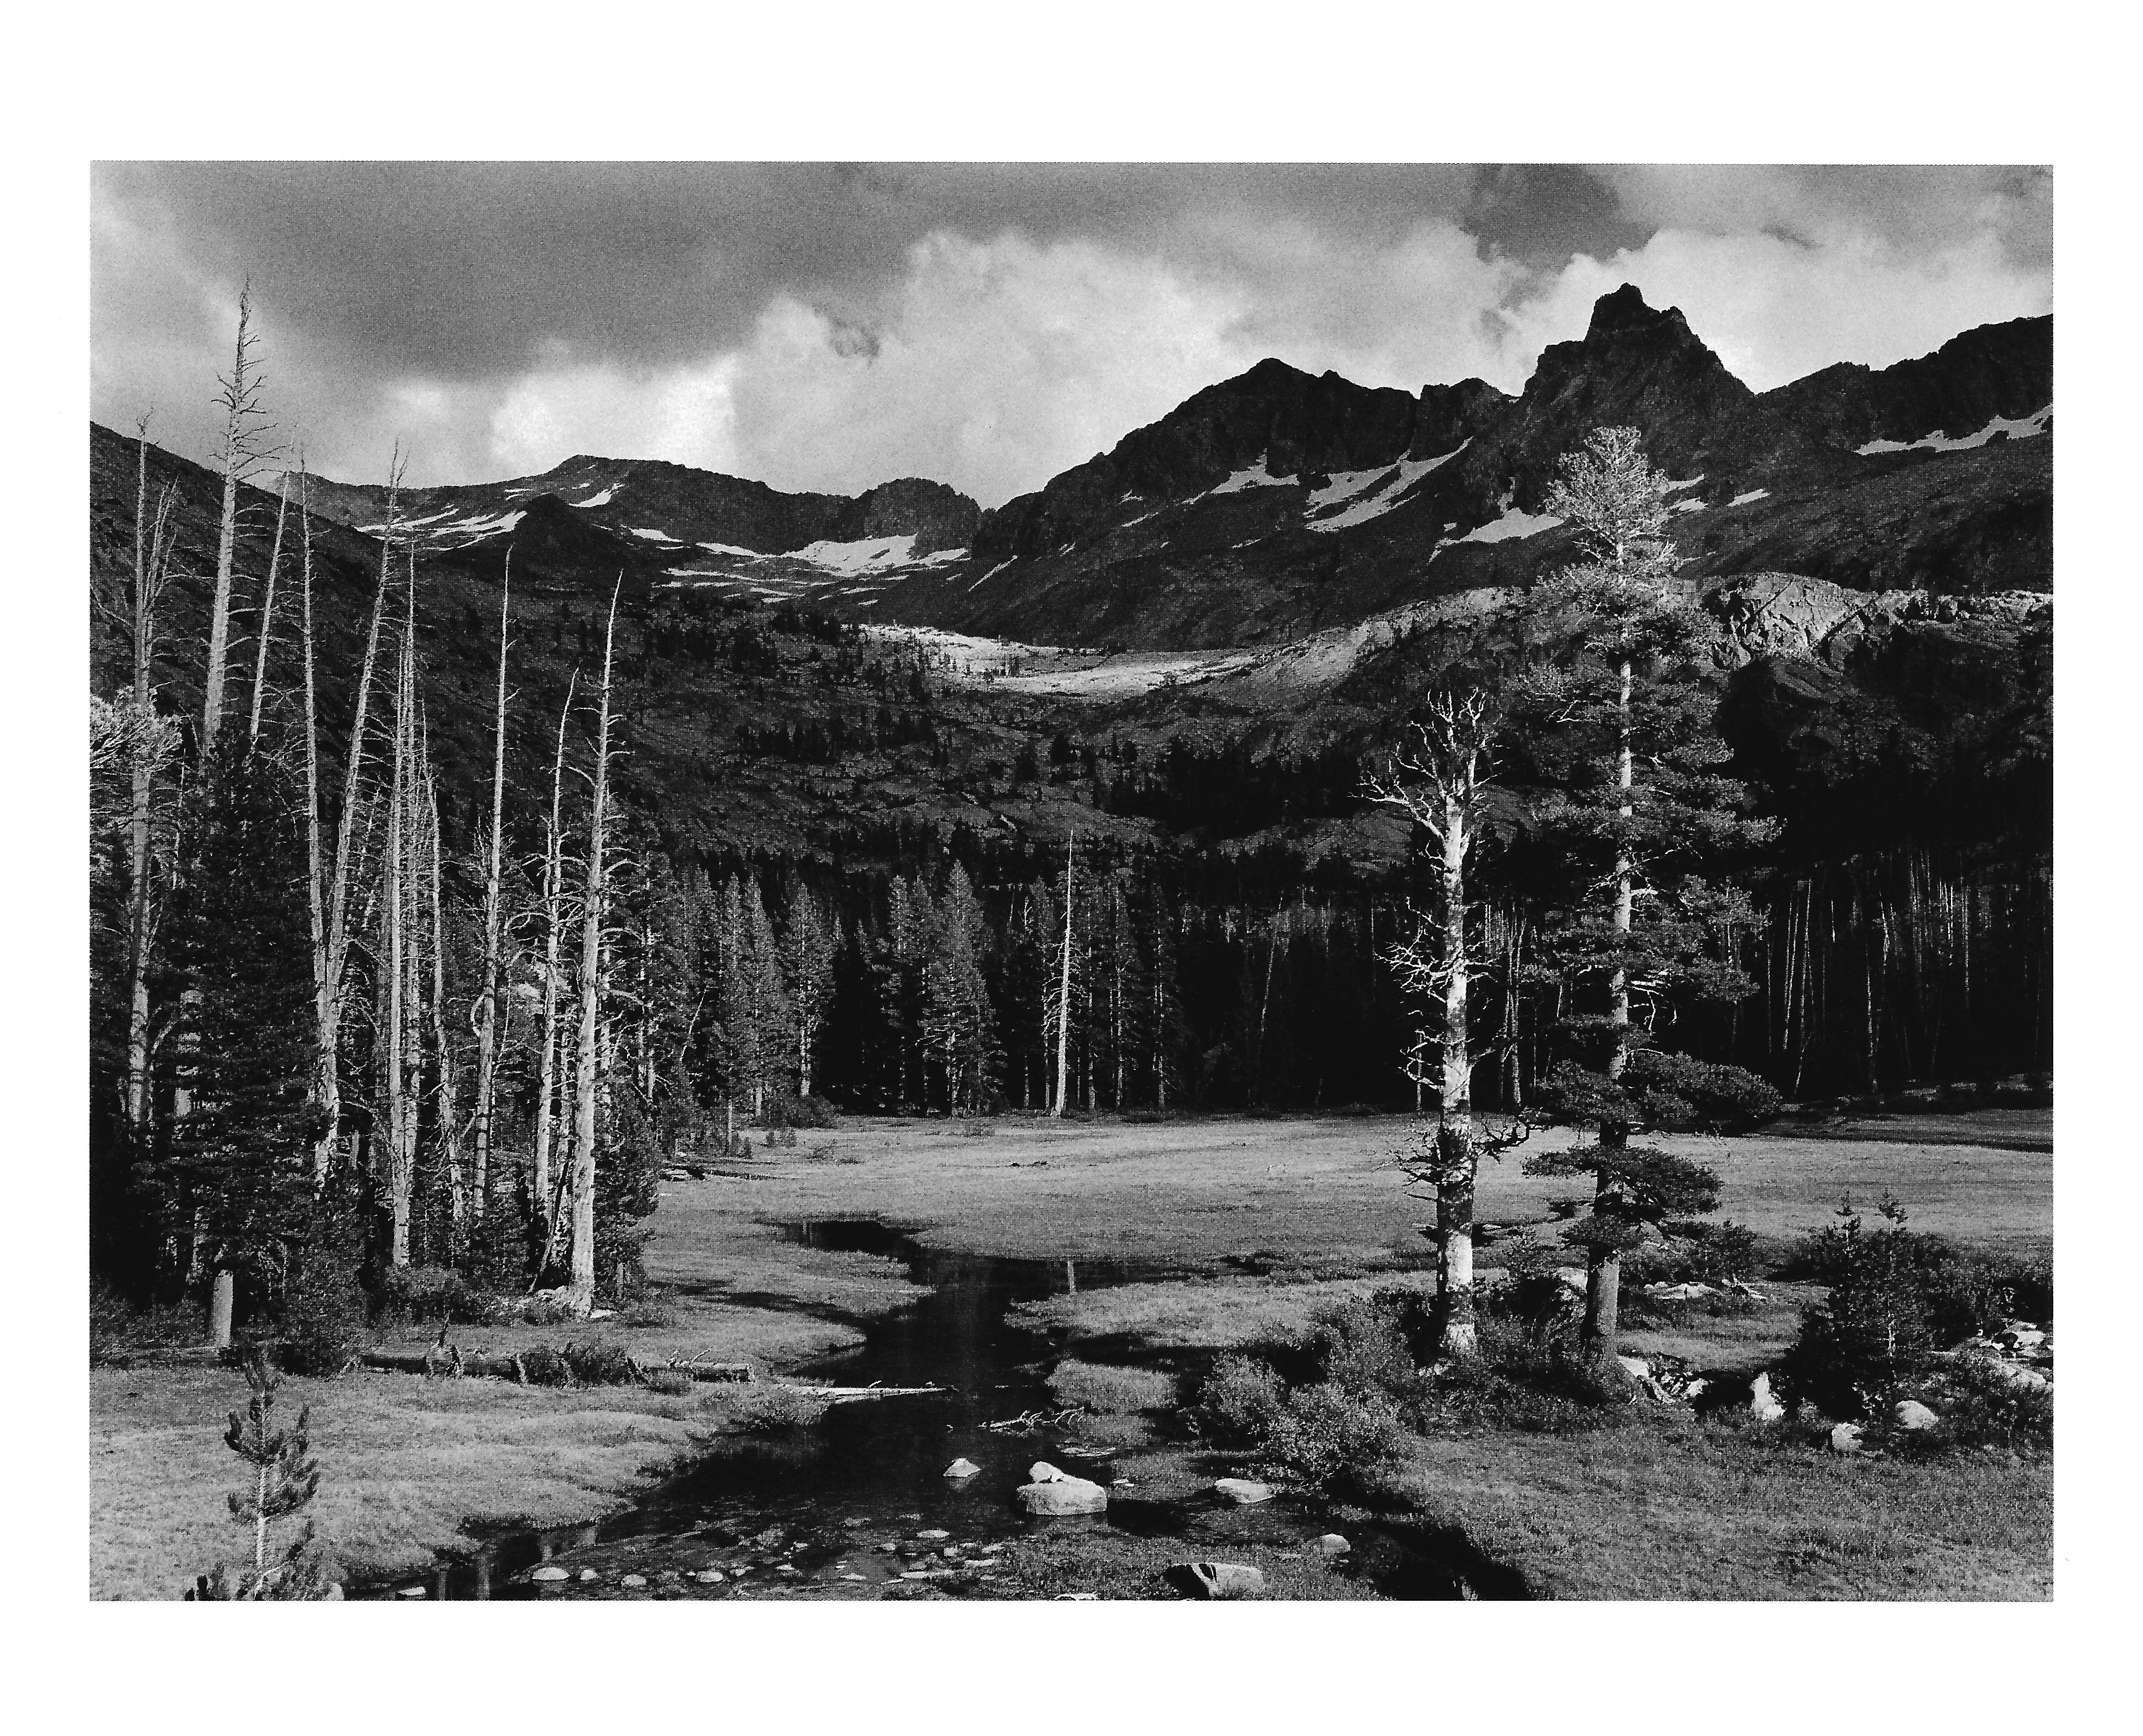 Ansel Adams. Mount Ansel Adams, Lyell Fork of the Merced river, 1935 ...